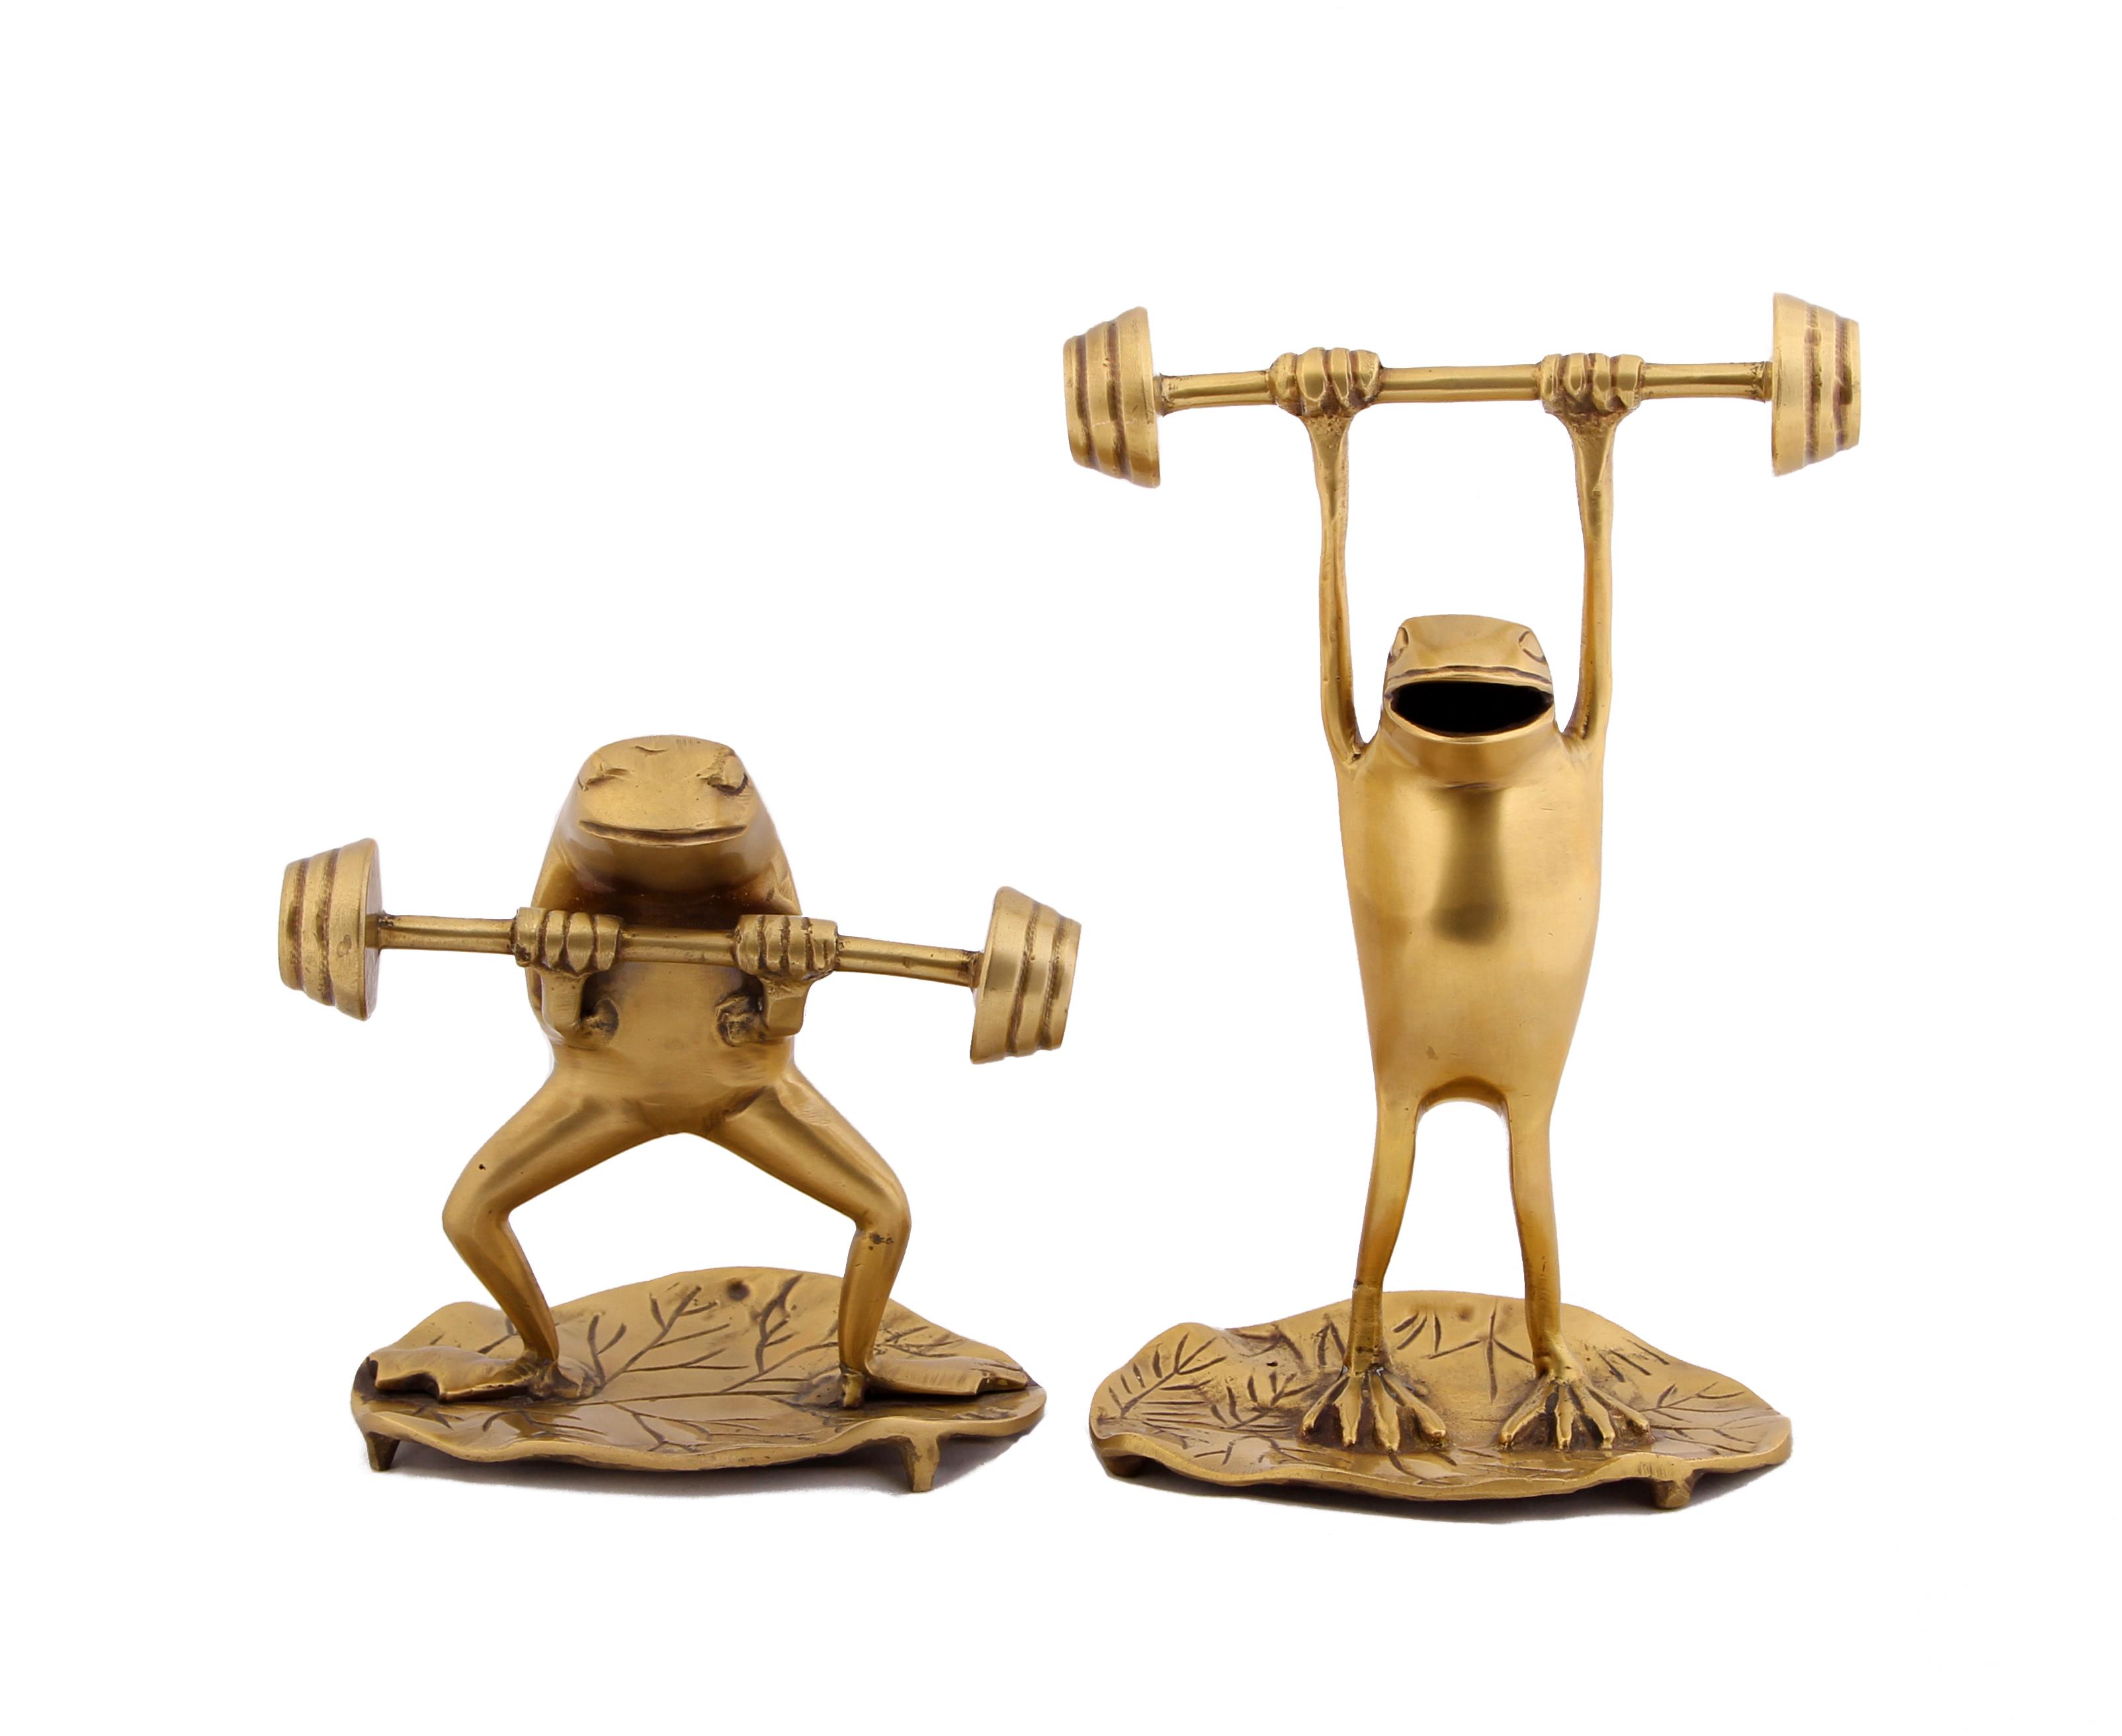 {} Ганг Статуэтка Лягушки Атлеты (Набор) статуэтка moda argenti статуэтка bn400g